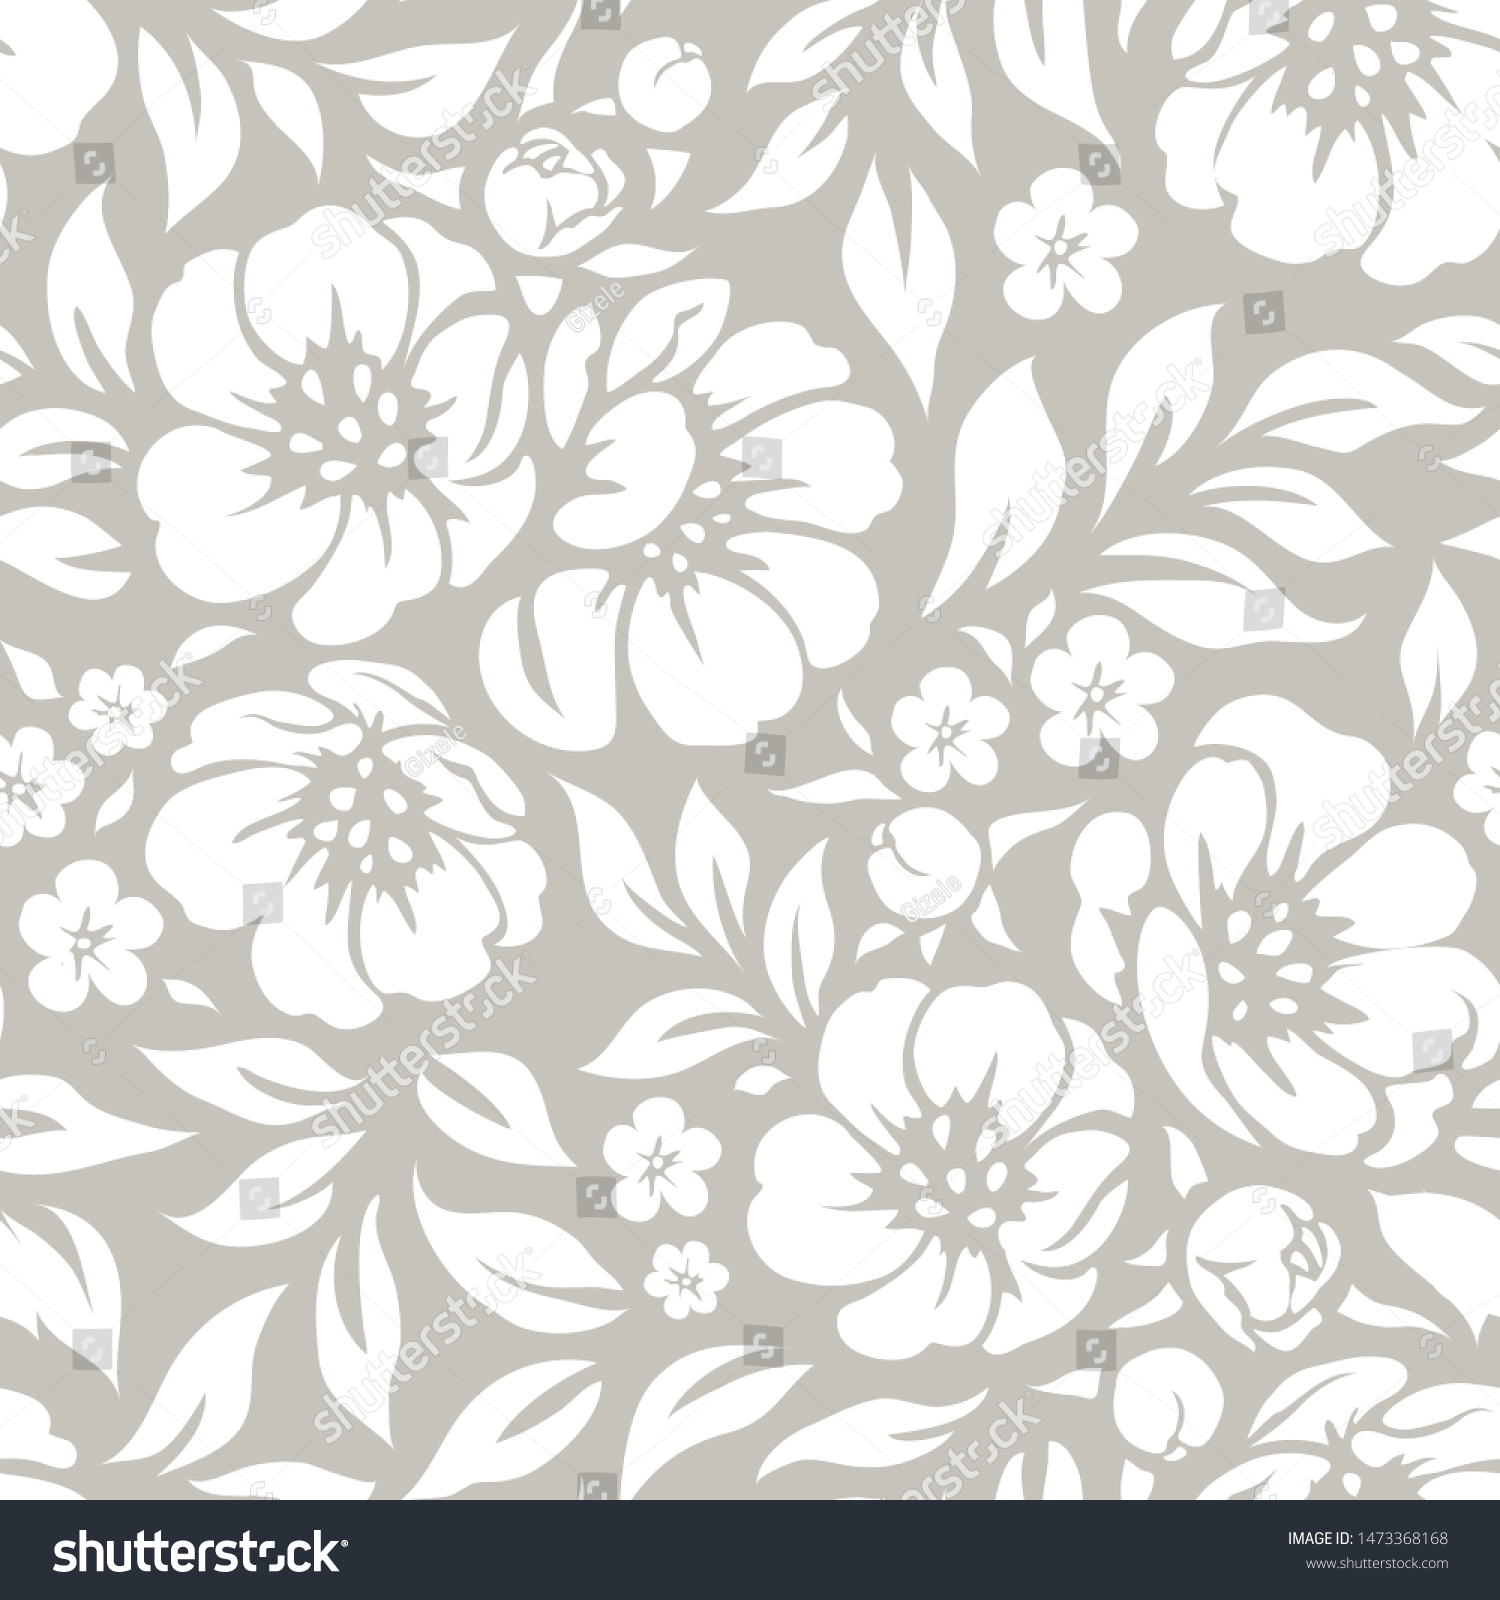 Seamless Vector Floral Wallpaper Decorative Vintage Stock Vector